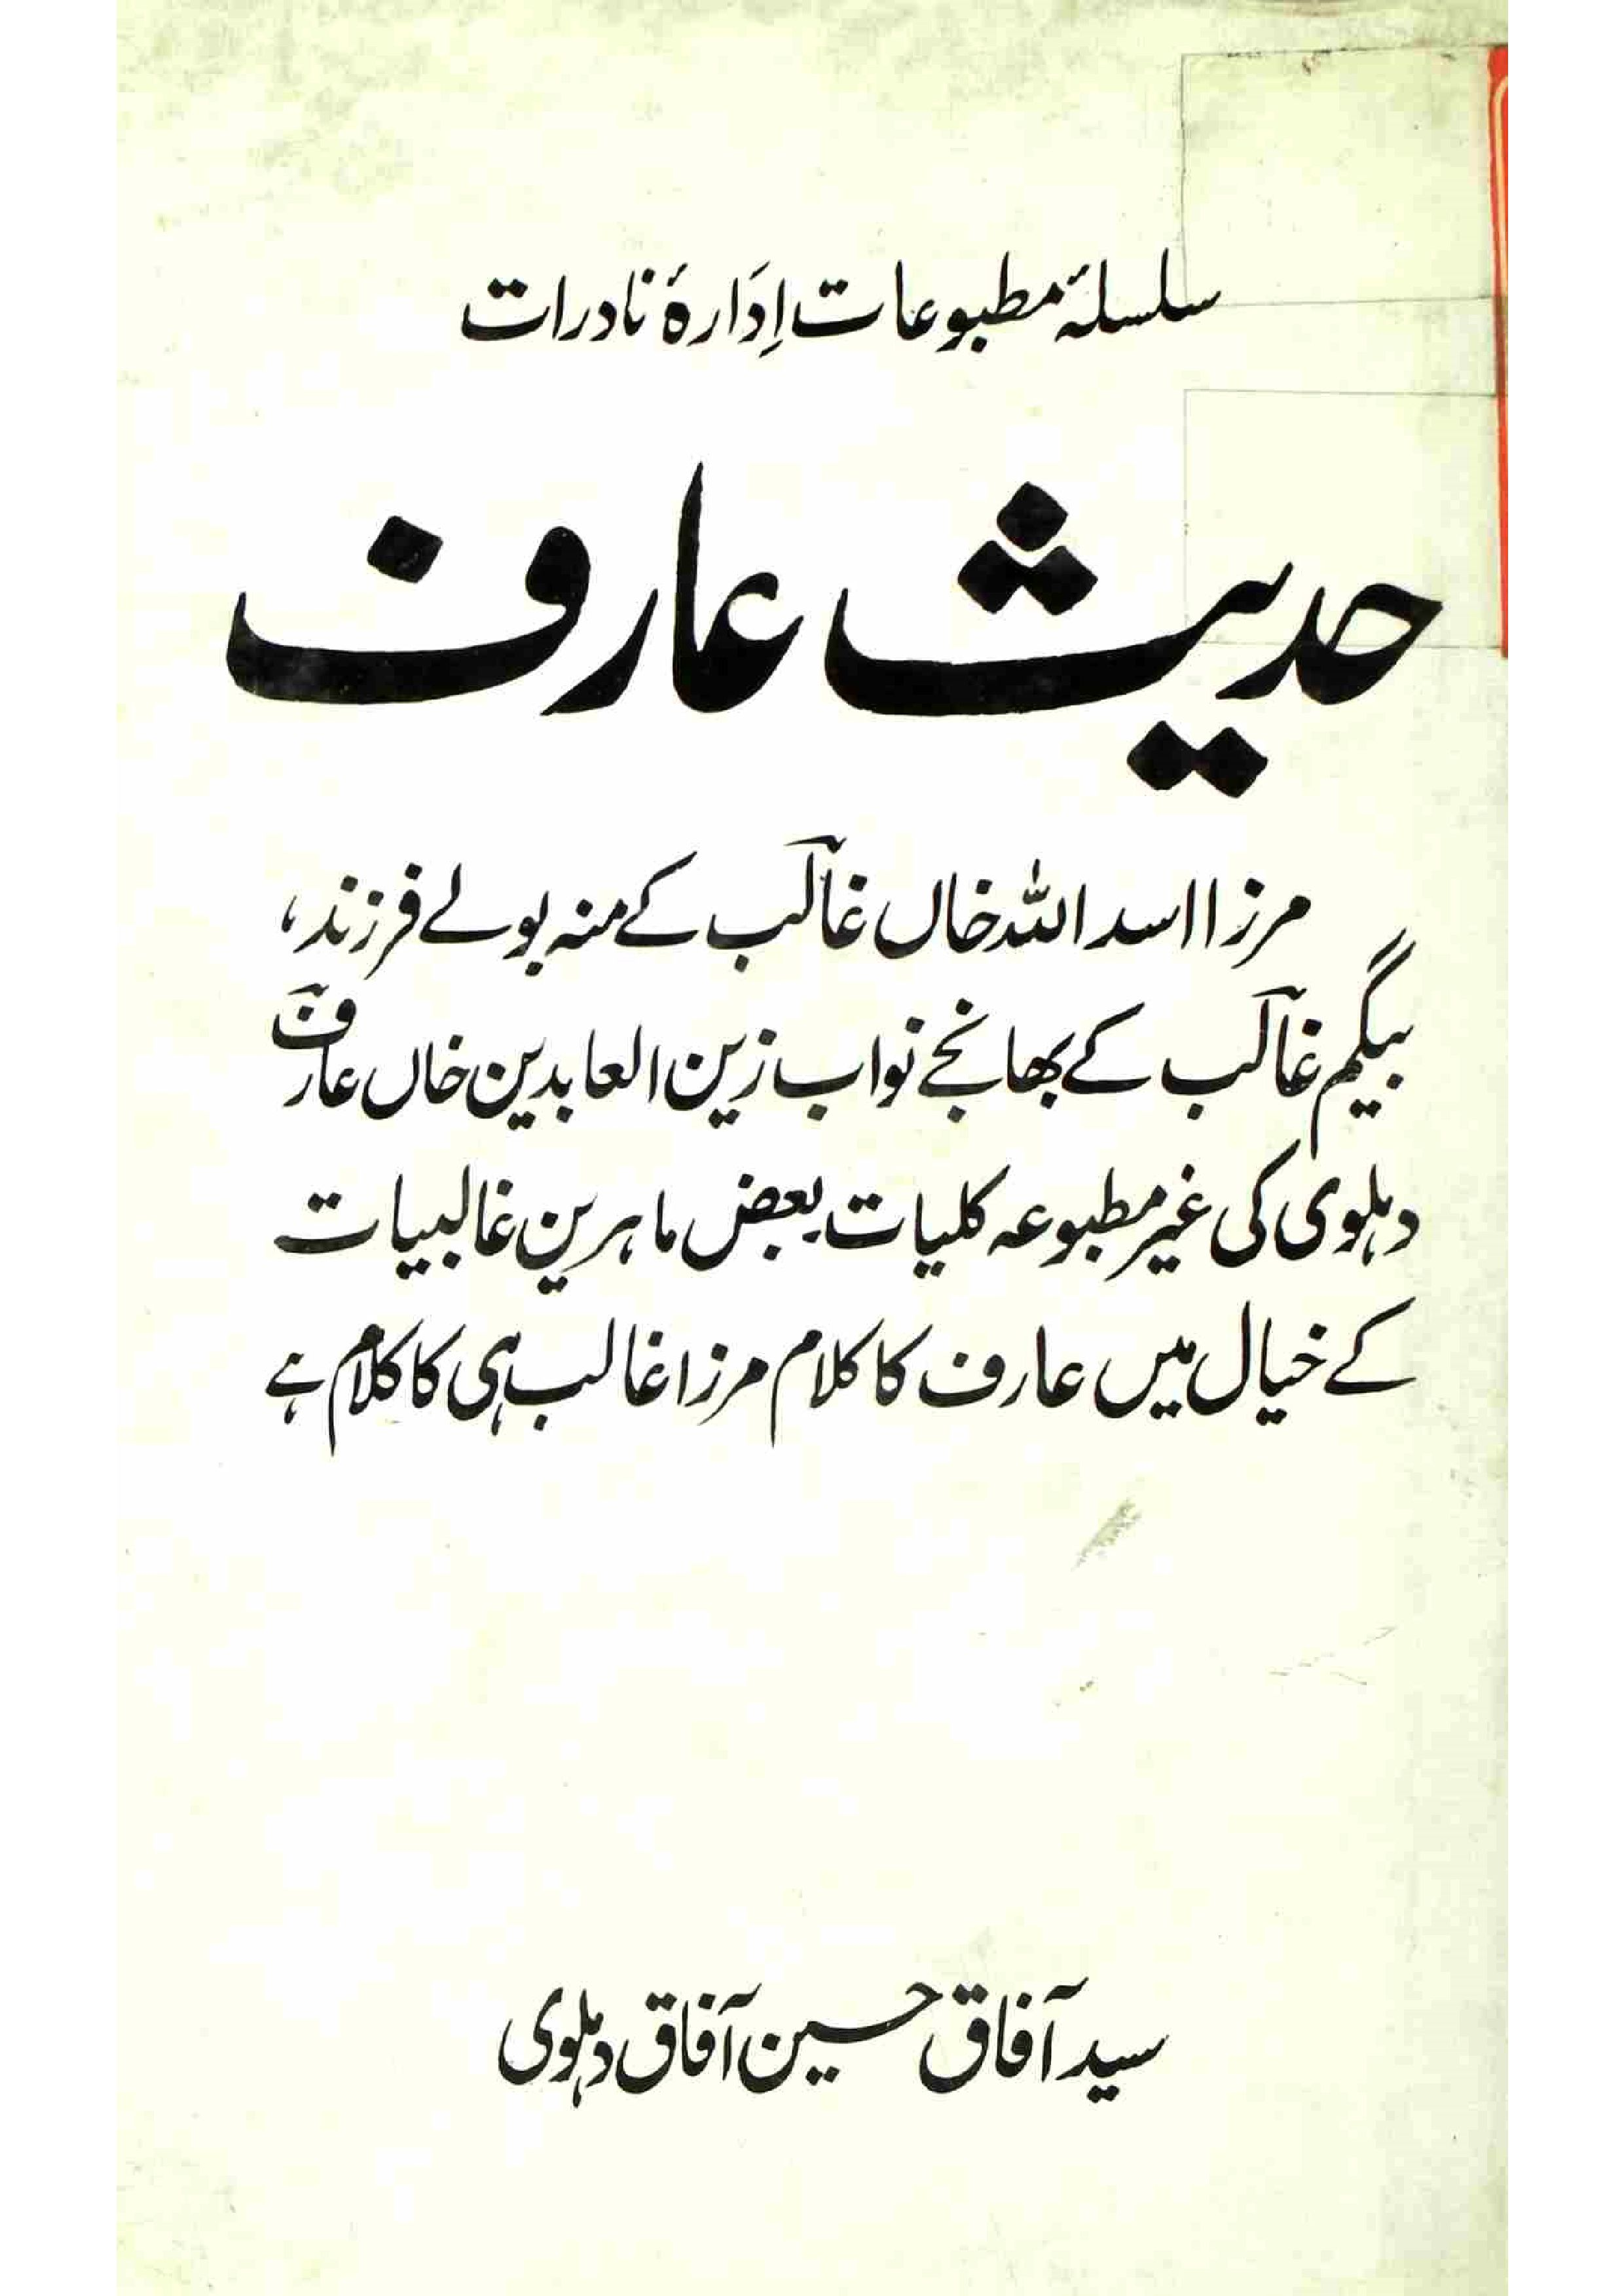 Hadis-e-Aarif